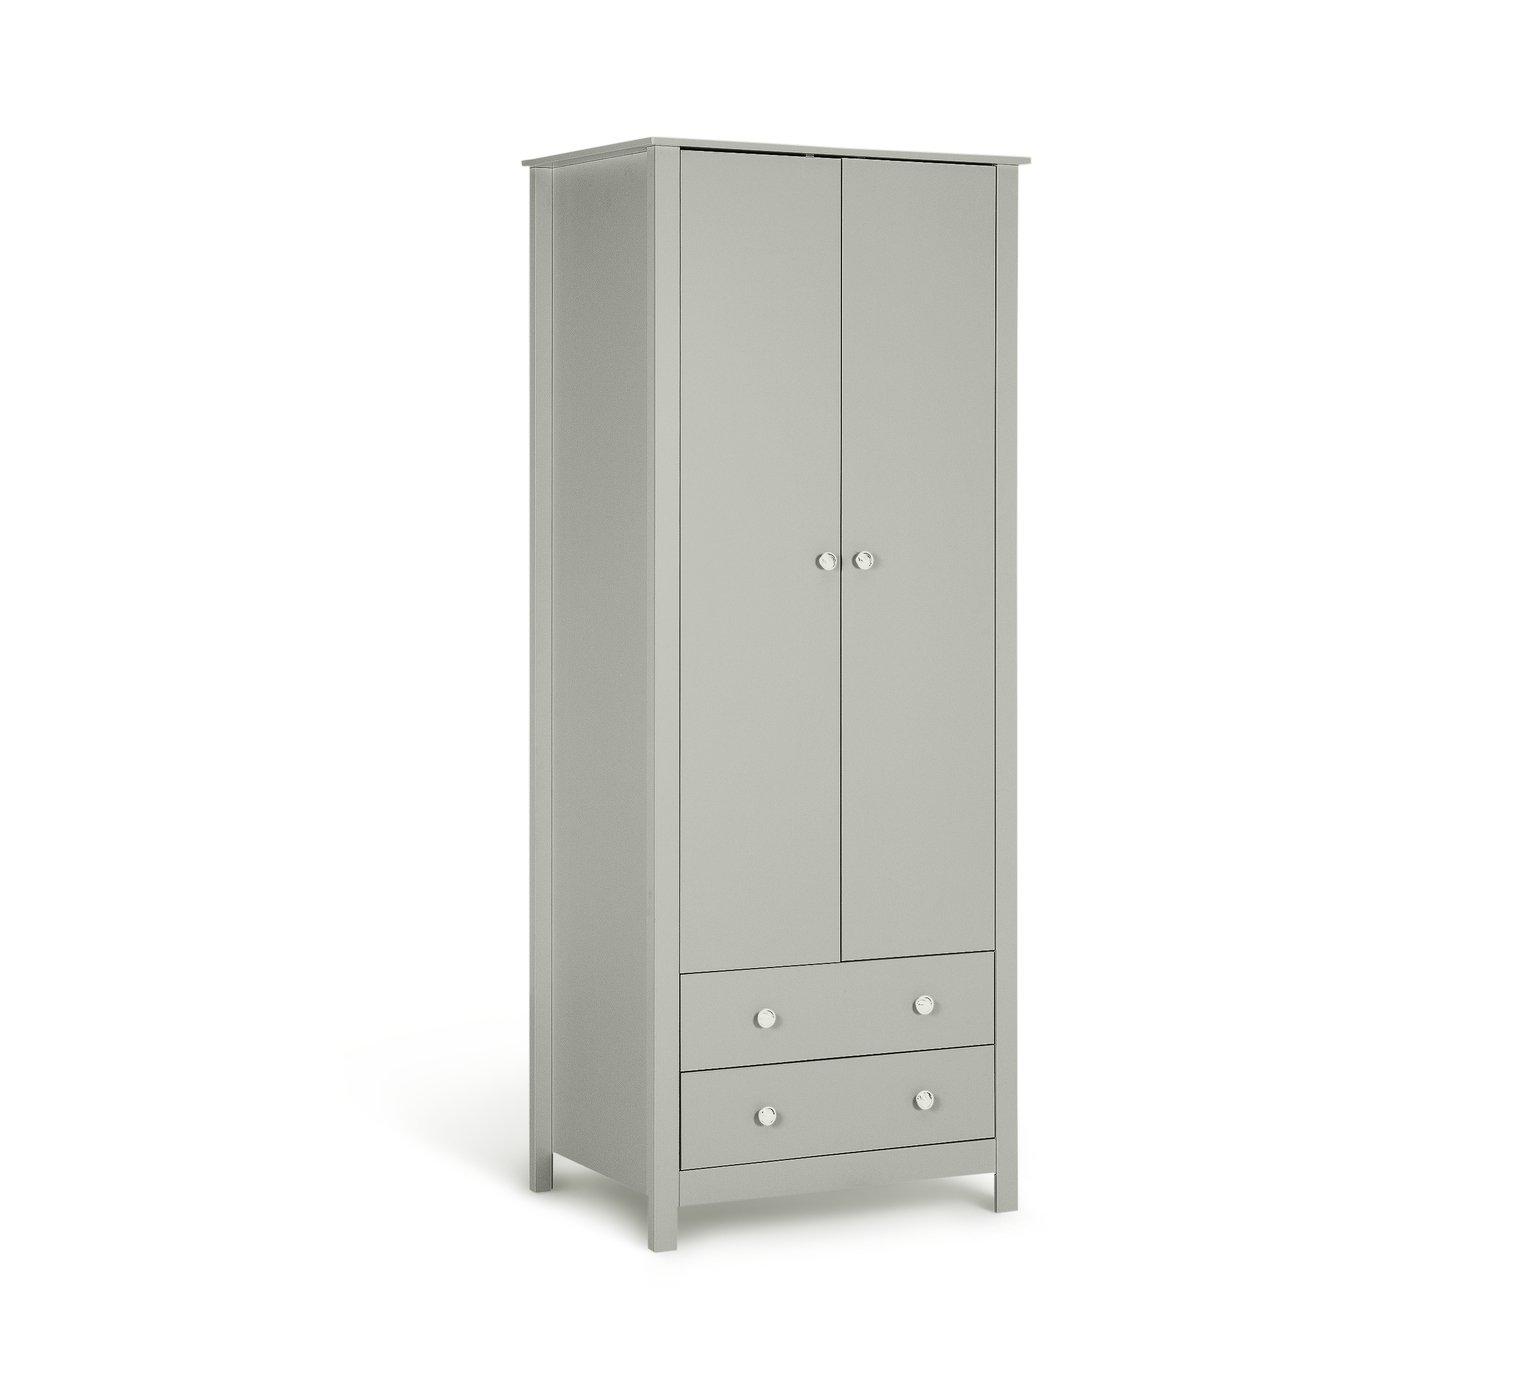 e8b94d38745 Argos Home Osaka 2 Door 2 Drawer Wardrobe - Soft Grey